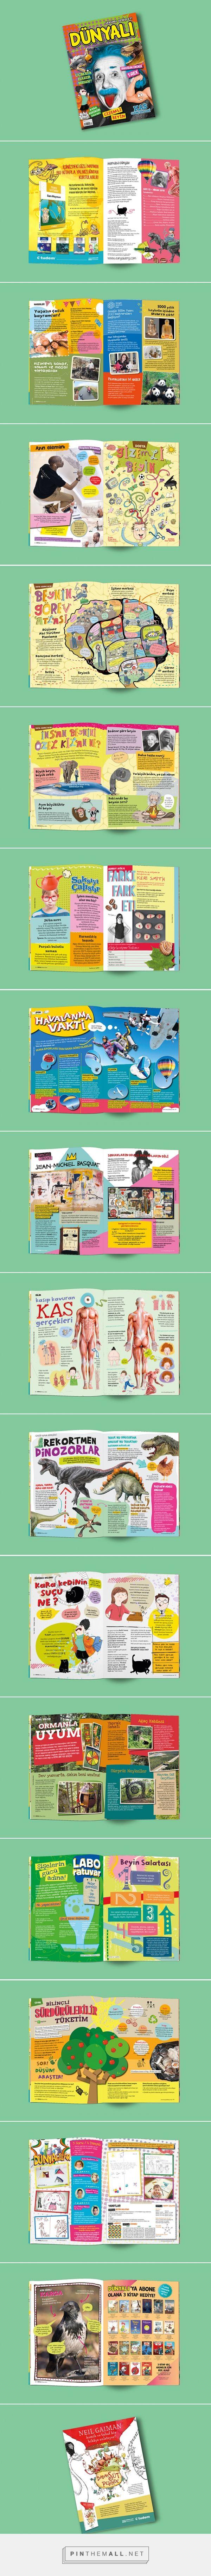 Dünyalı Dergi 13 - Dünyalı Magazine for kids on Behance - created via http://pinthemall.net